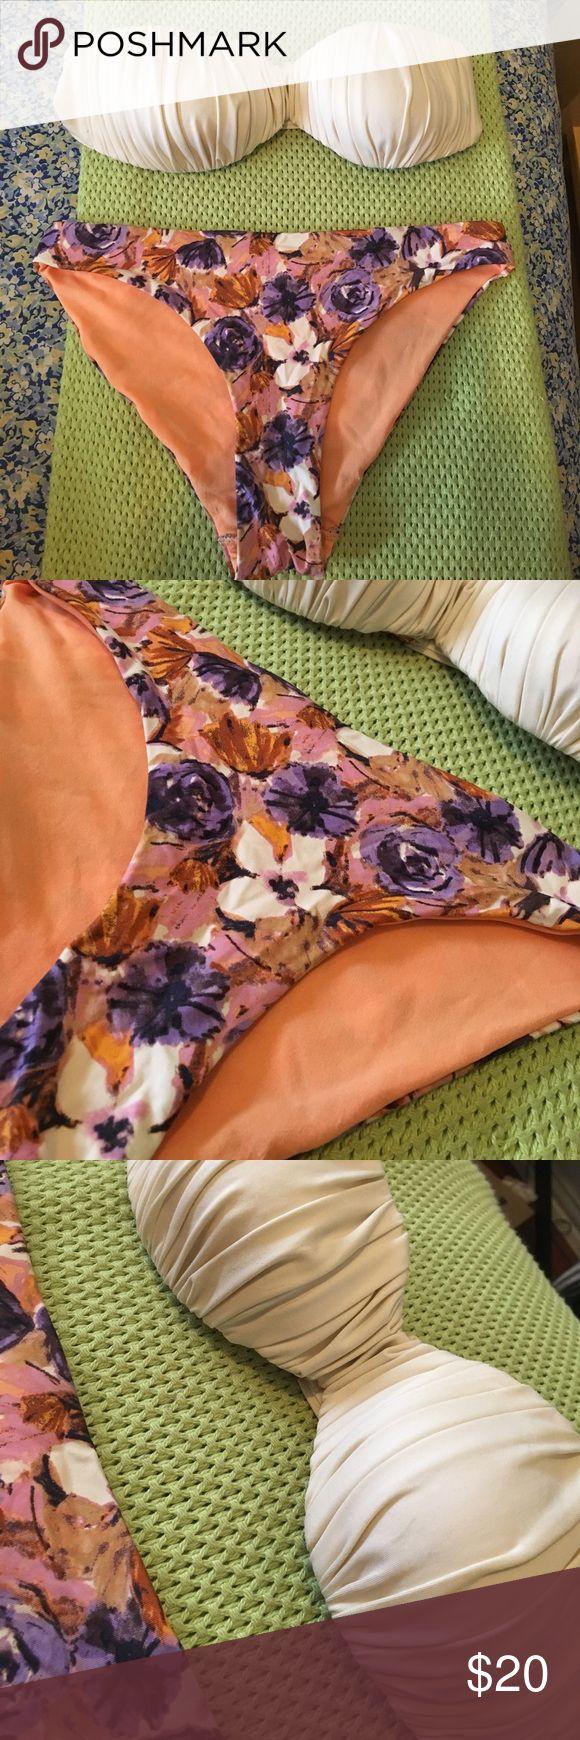 H&M orange, purple and cream bikini set! Very cute floral print on the bottoms! Size 4 bottoms and size 6 top H&M Swim Bikinis